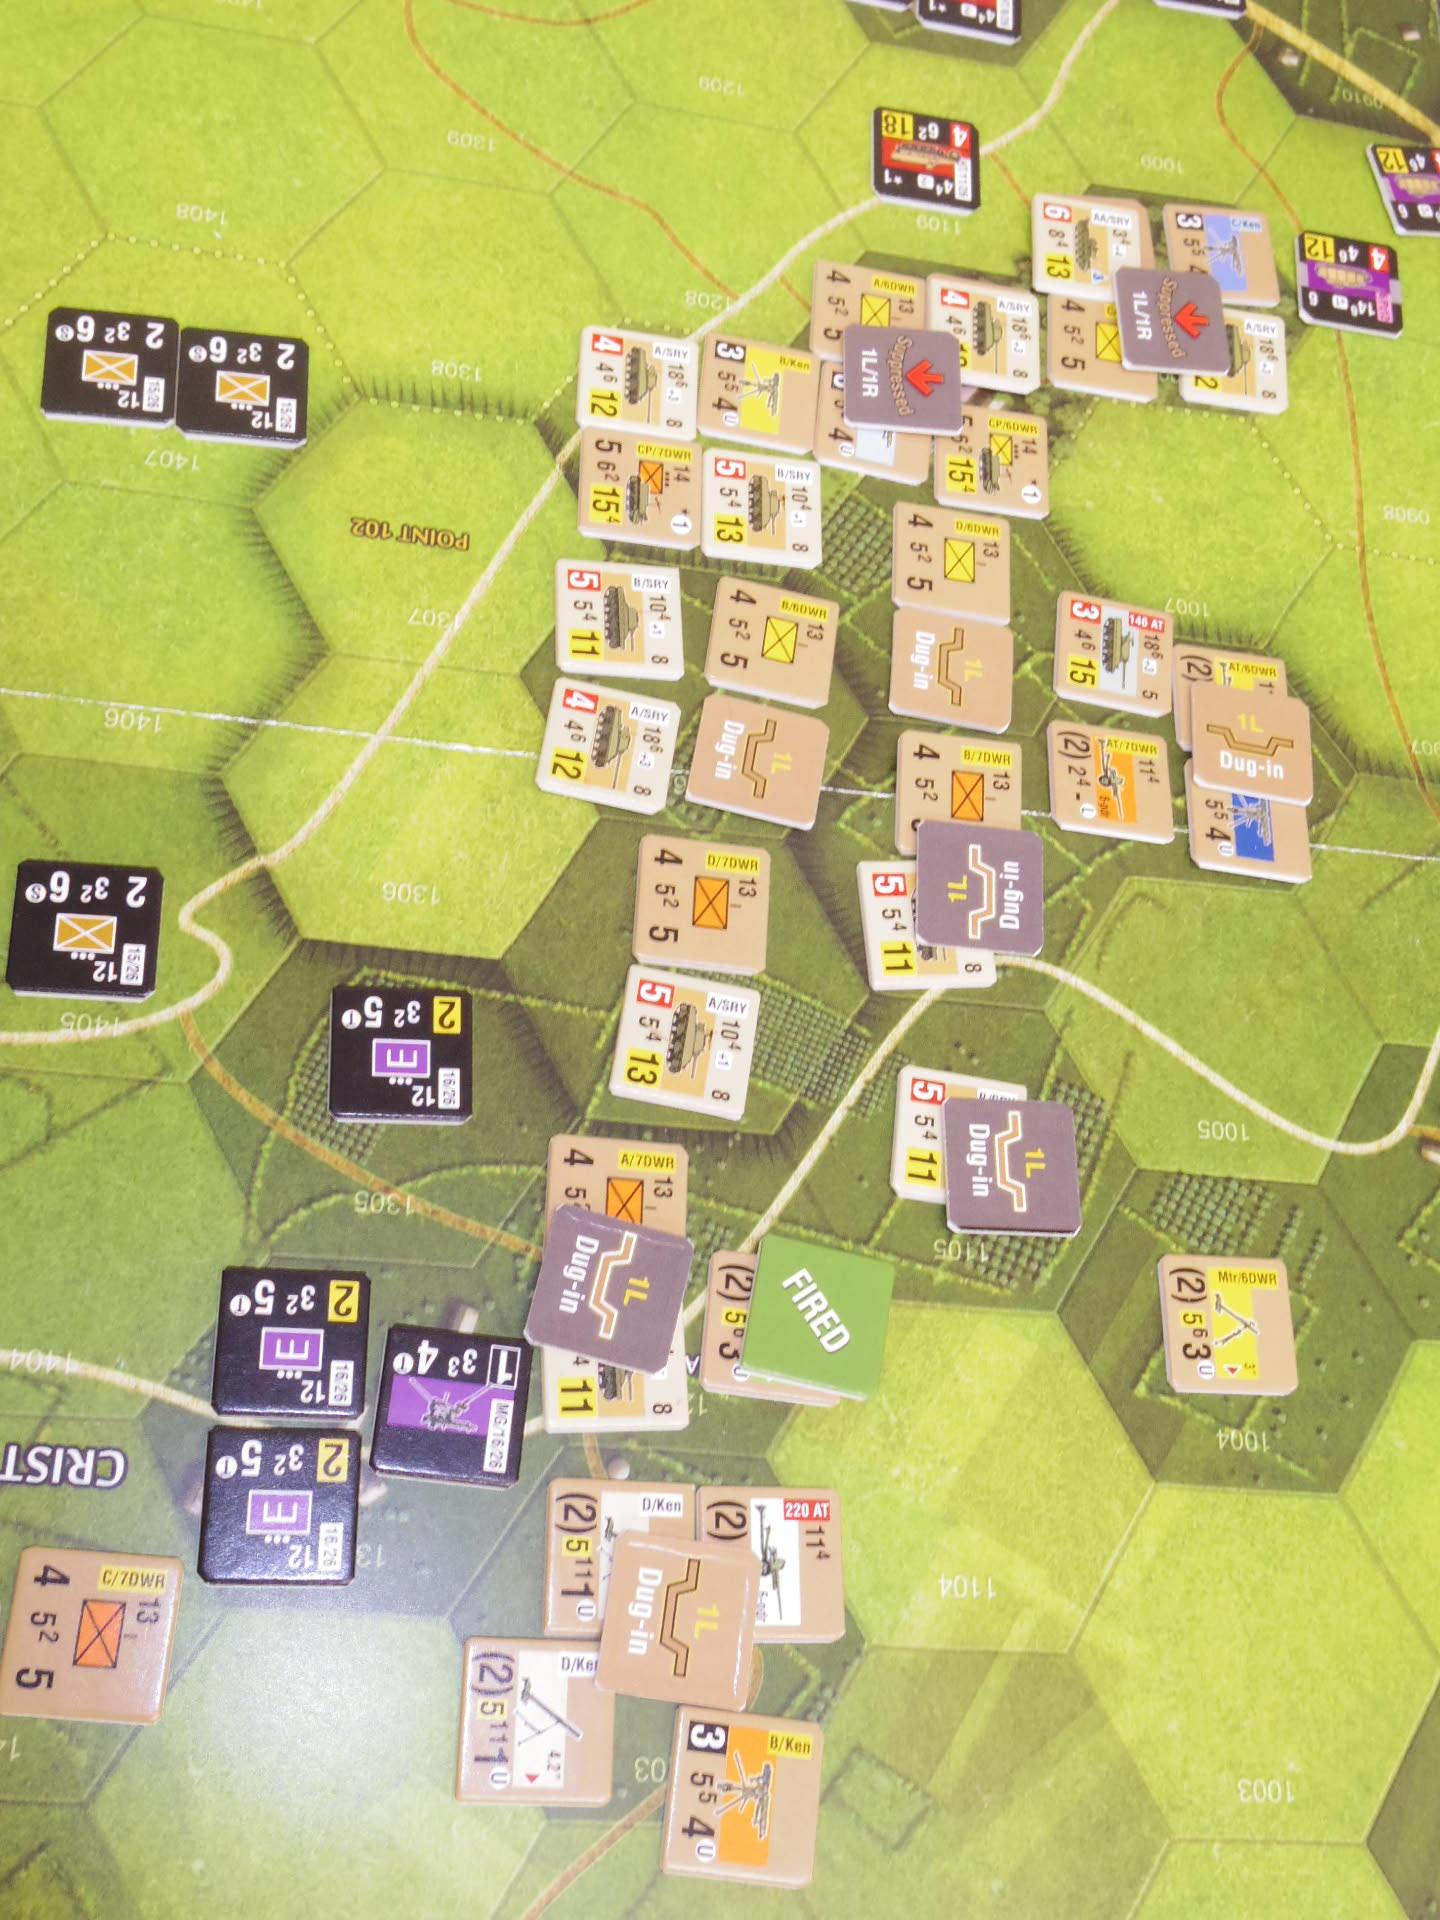 YSGA三月例会の様子その7〔(GMT)Operation Dauntlessシナリオ18.3「Heavy Counterattack」 1944年6月18日14:00〜〕_b0173672_06531452.jpg